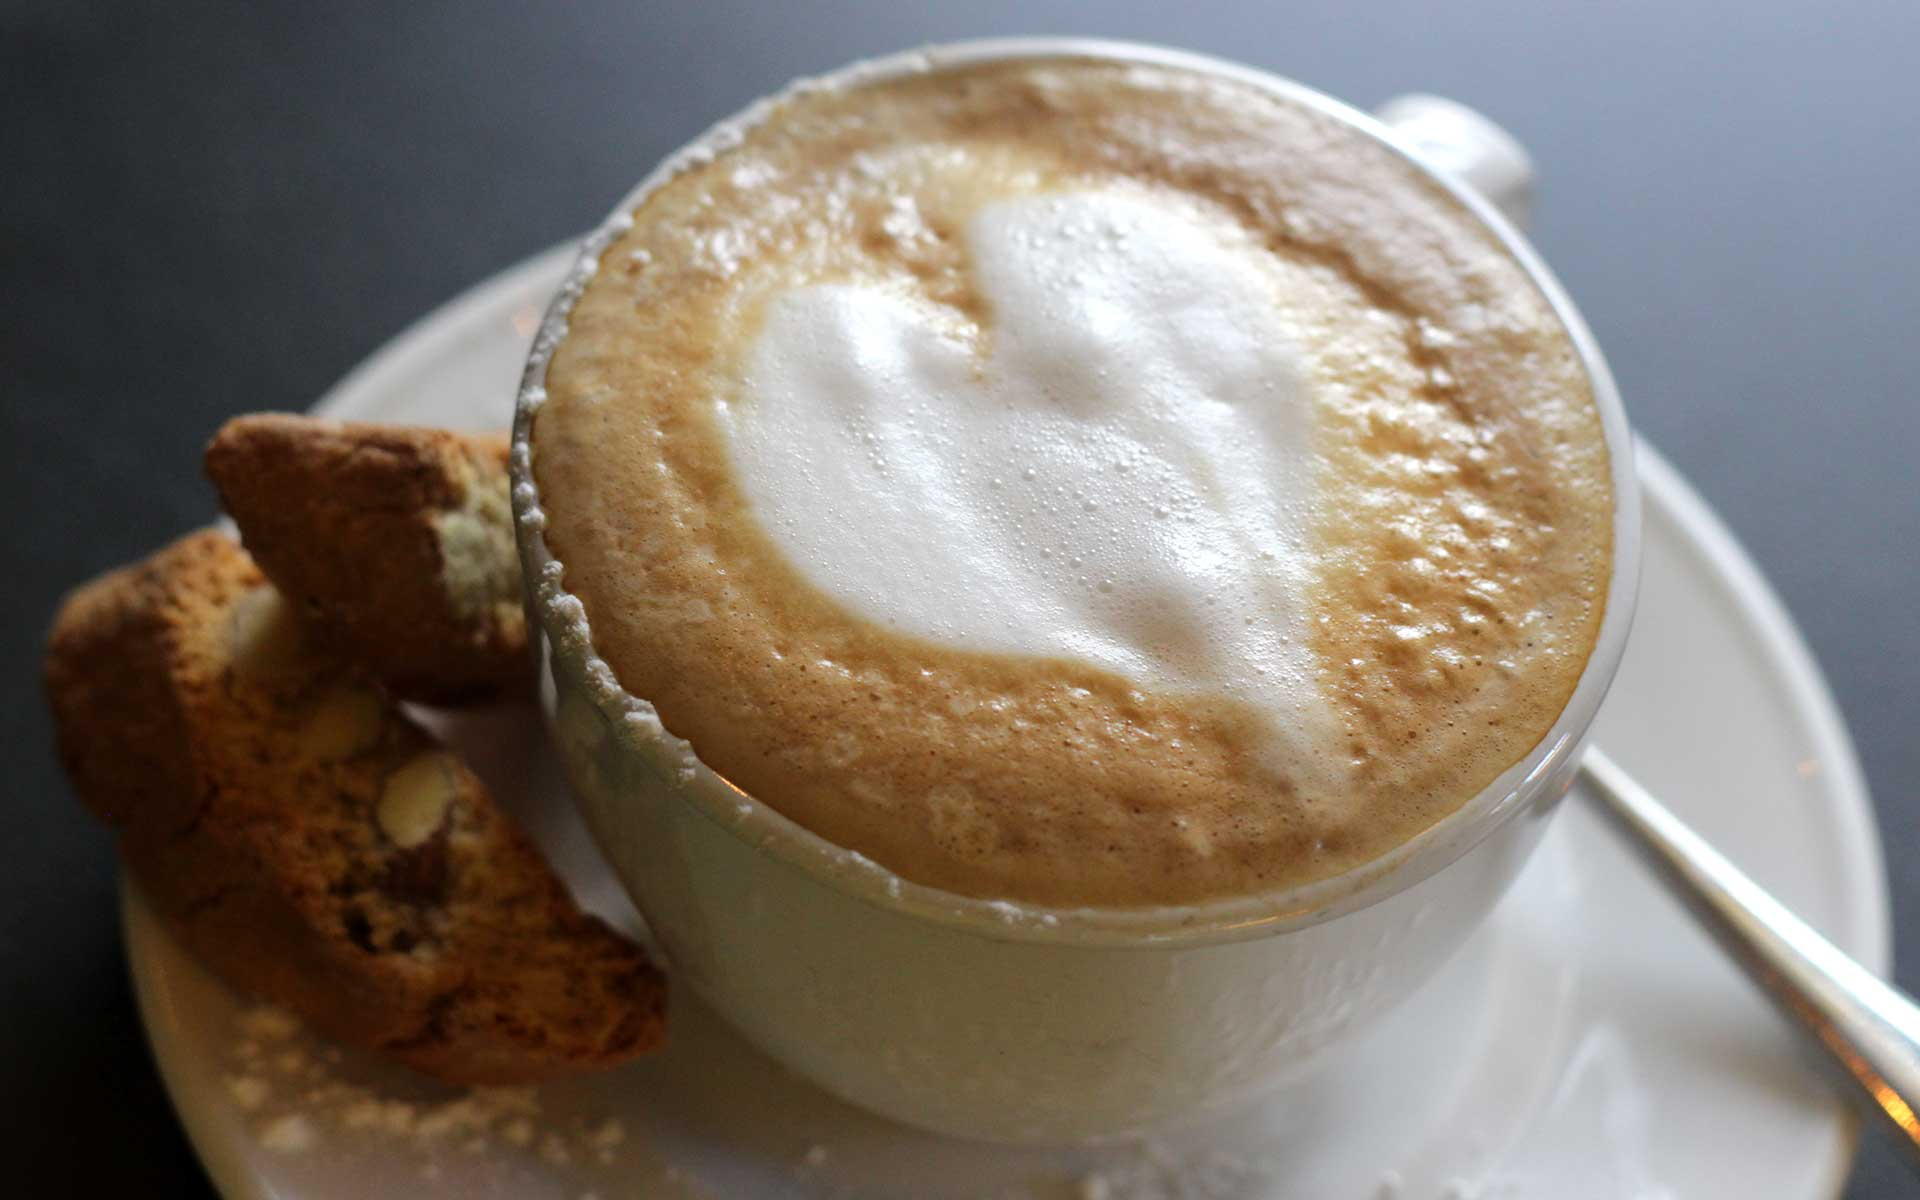 barbatella gelato & coffee bar